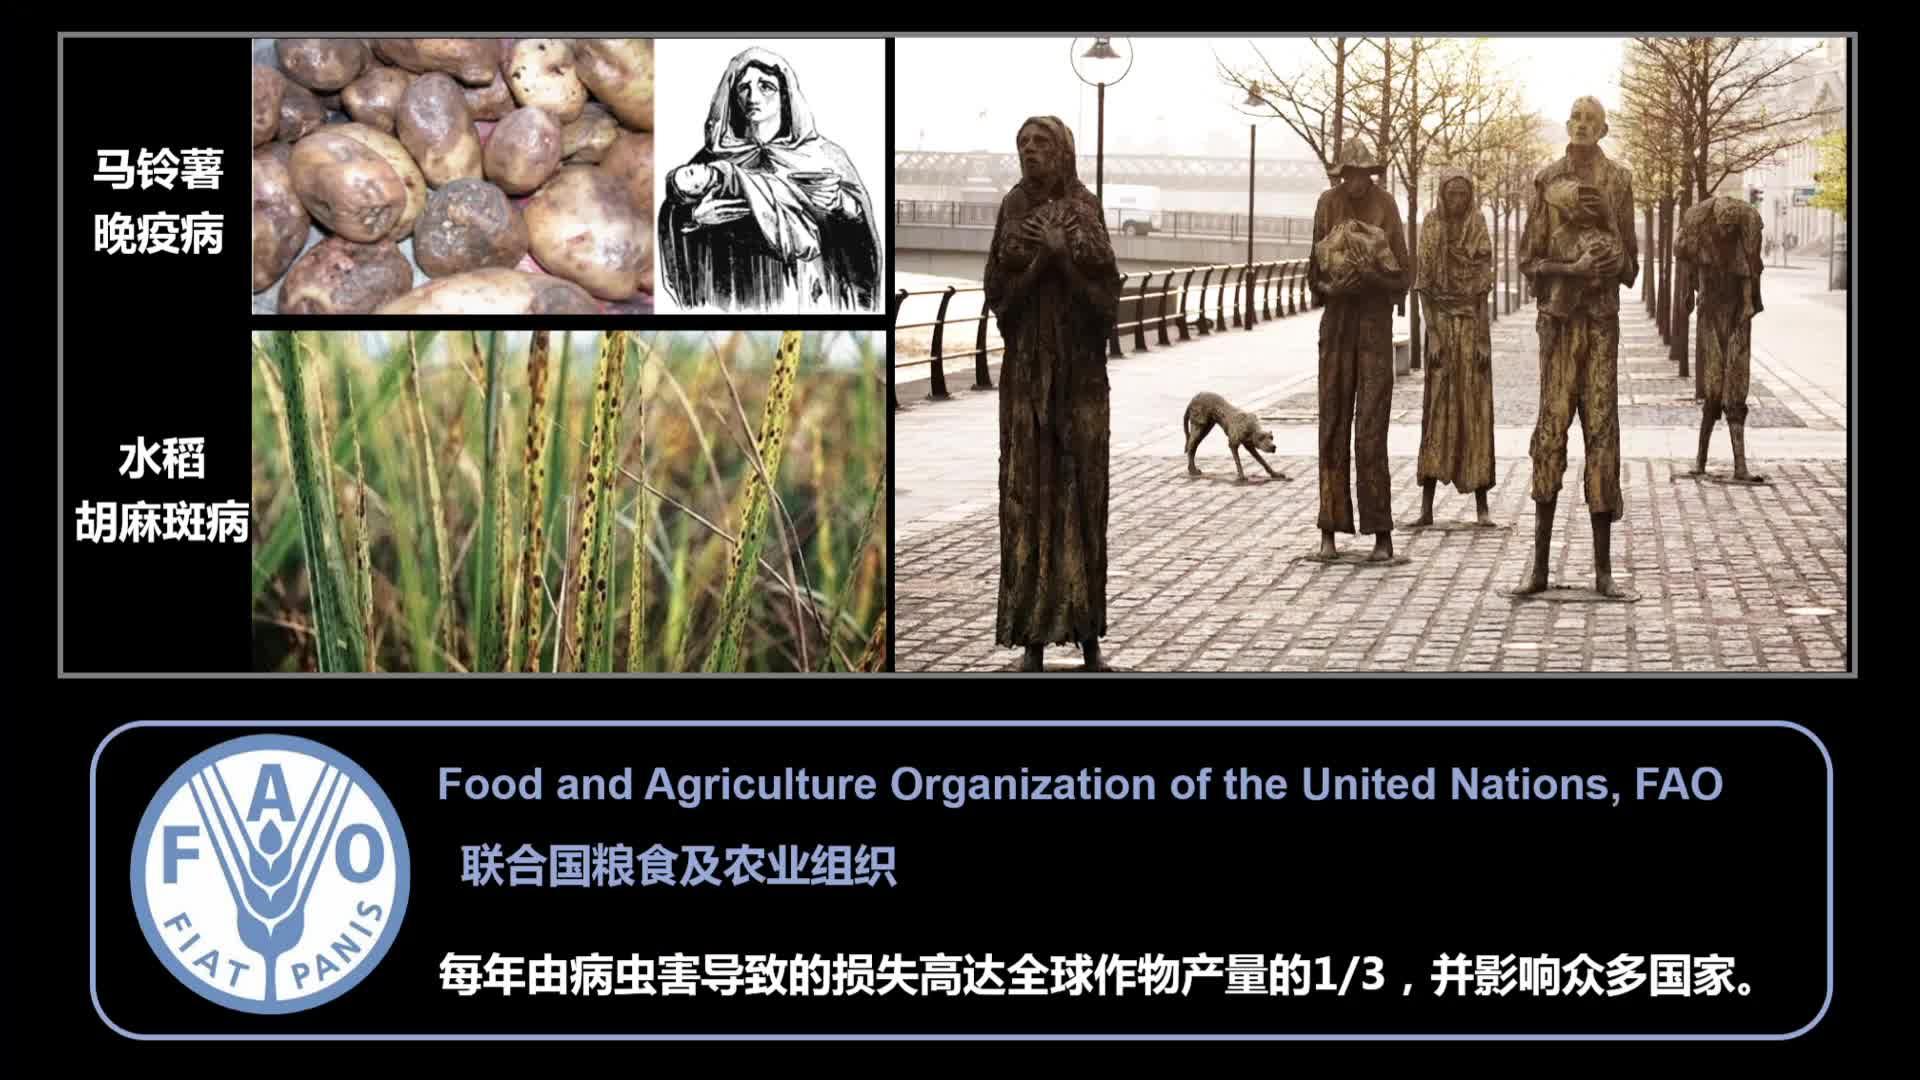 CC讲坛——郭惠珊:跨界打靶,植物与真菌背后的无间道